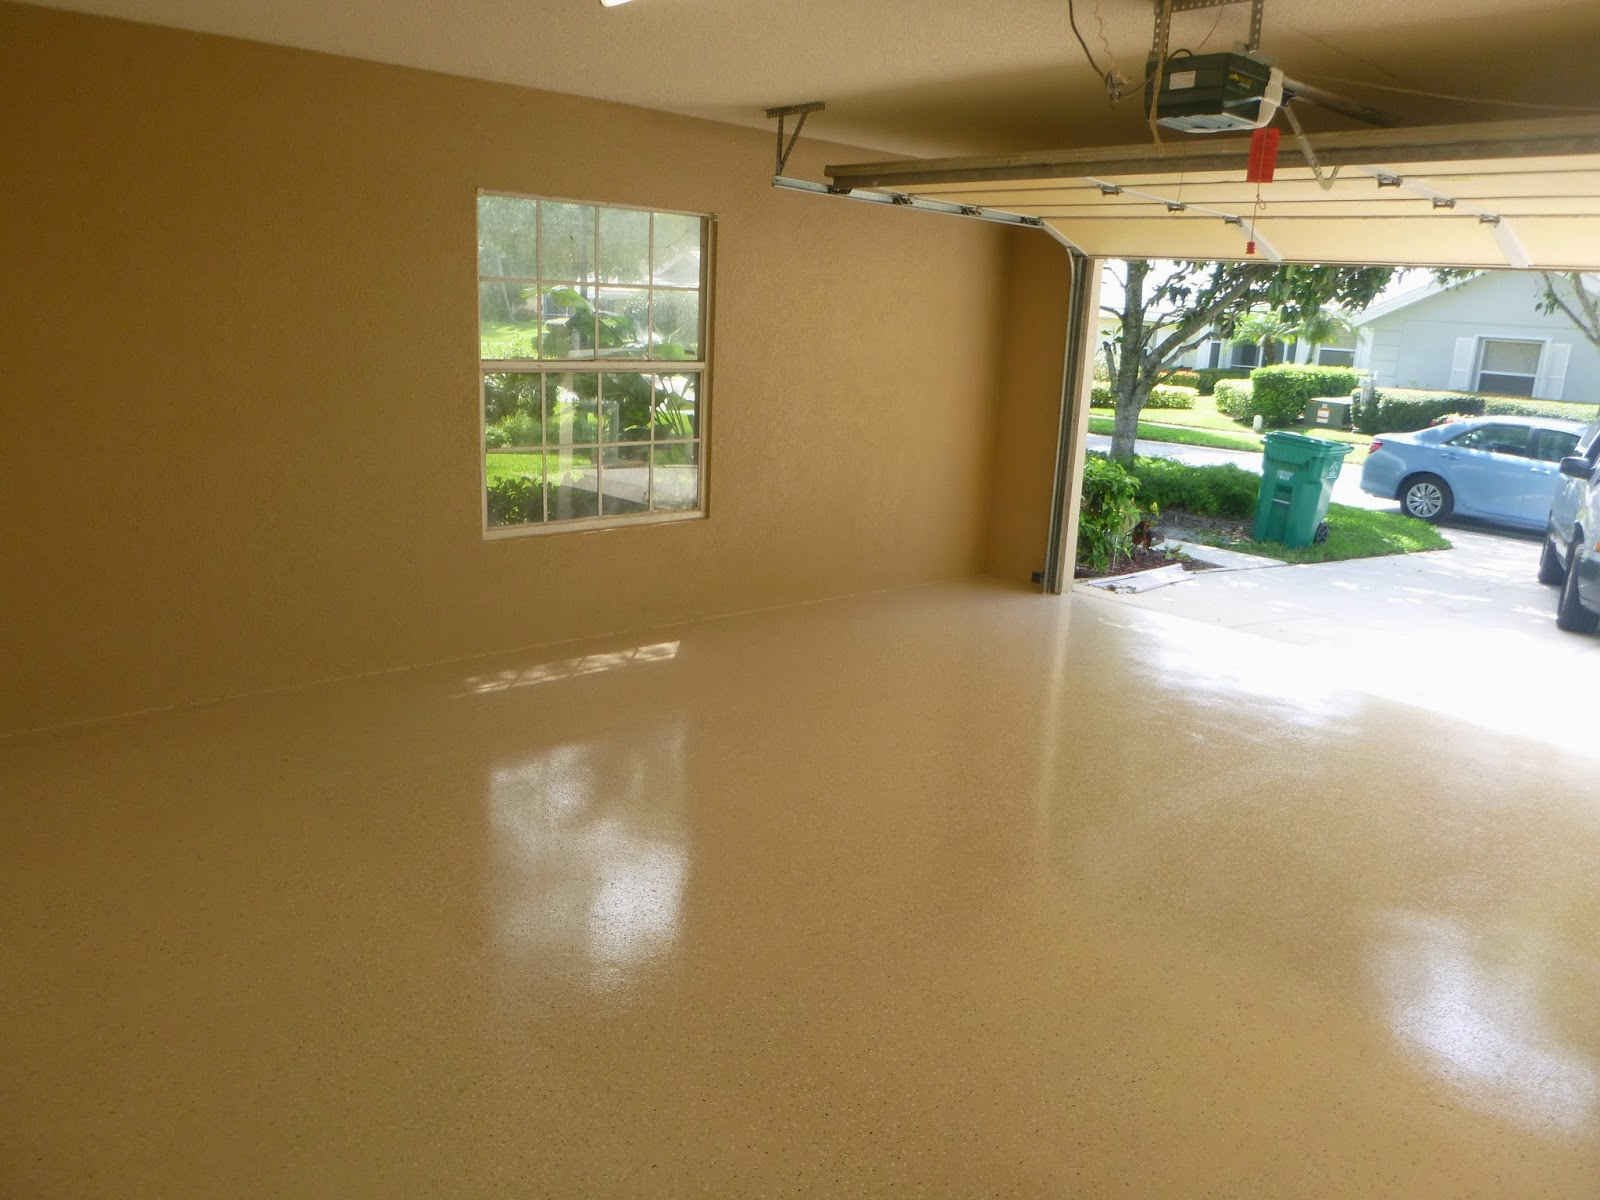 painter of port st lucie florida 772 801 9711 garage floor coating using h c shield crete. Black Bedroom Furniture Sets. Home Design Ideas